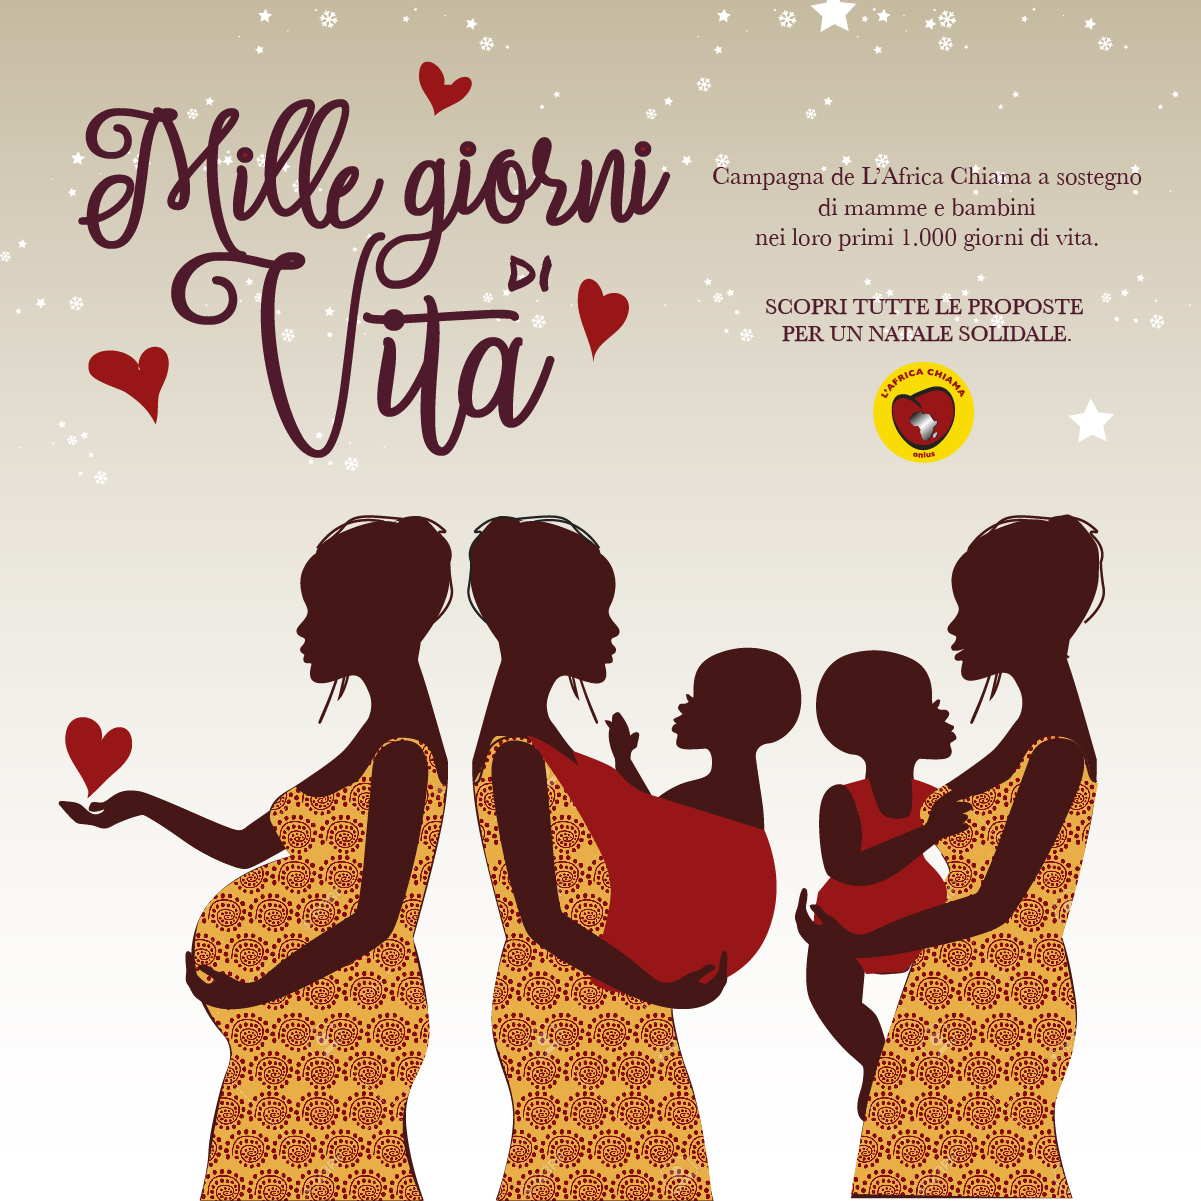 http://www.lafricachiama.org/images/calendario_solidale_2018_mille_giorni_di_vita.jpg